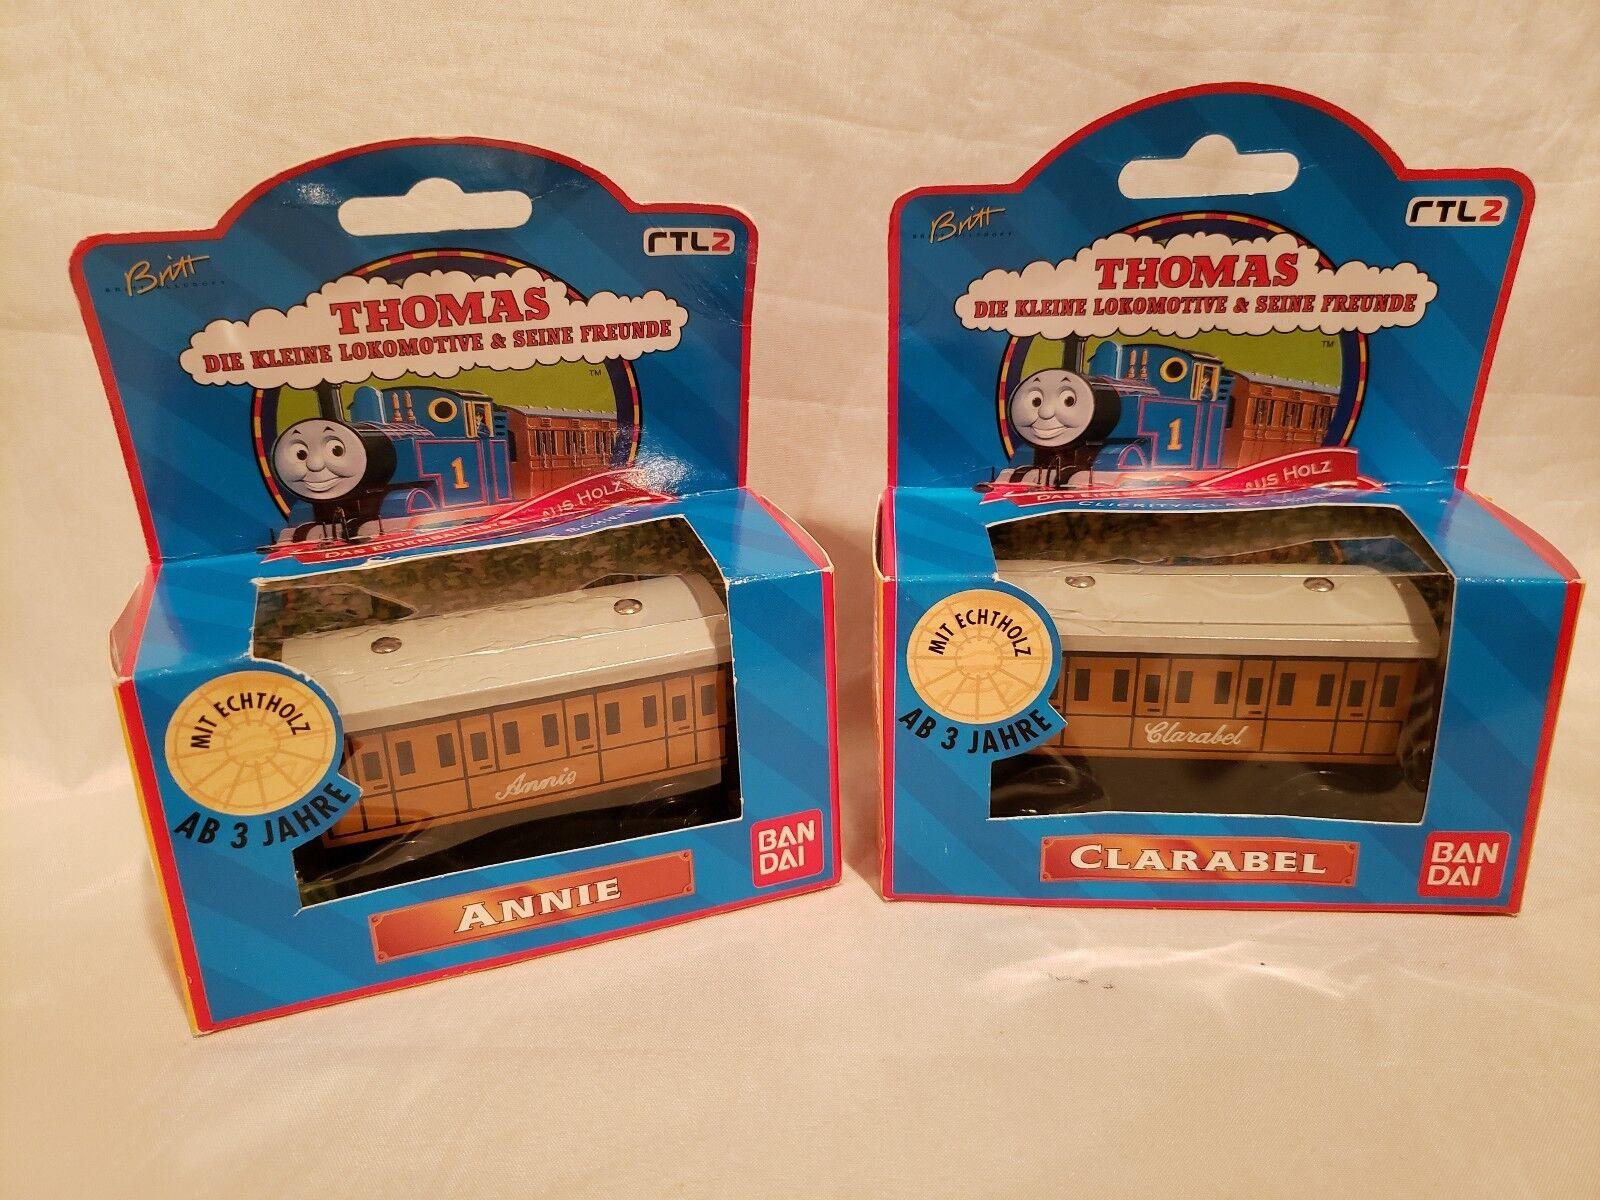 Thomas wooden Railway Rare New In Box German Version Ban dai Annie and Clarabel